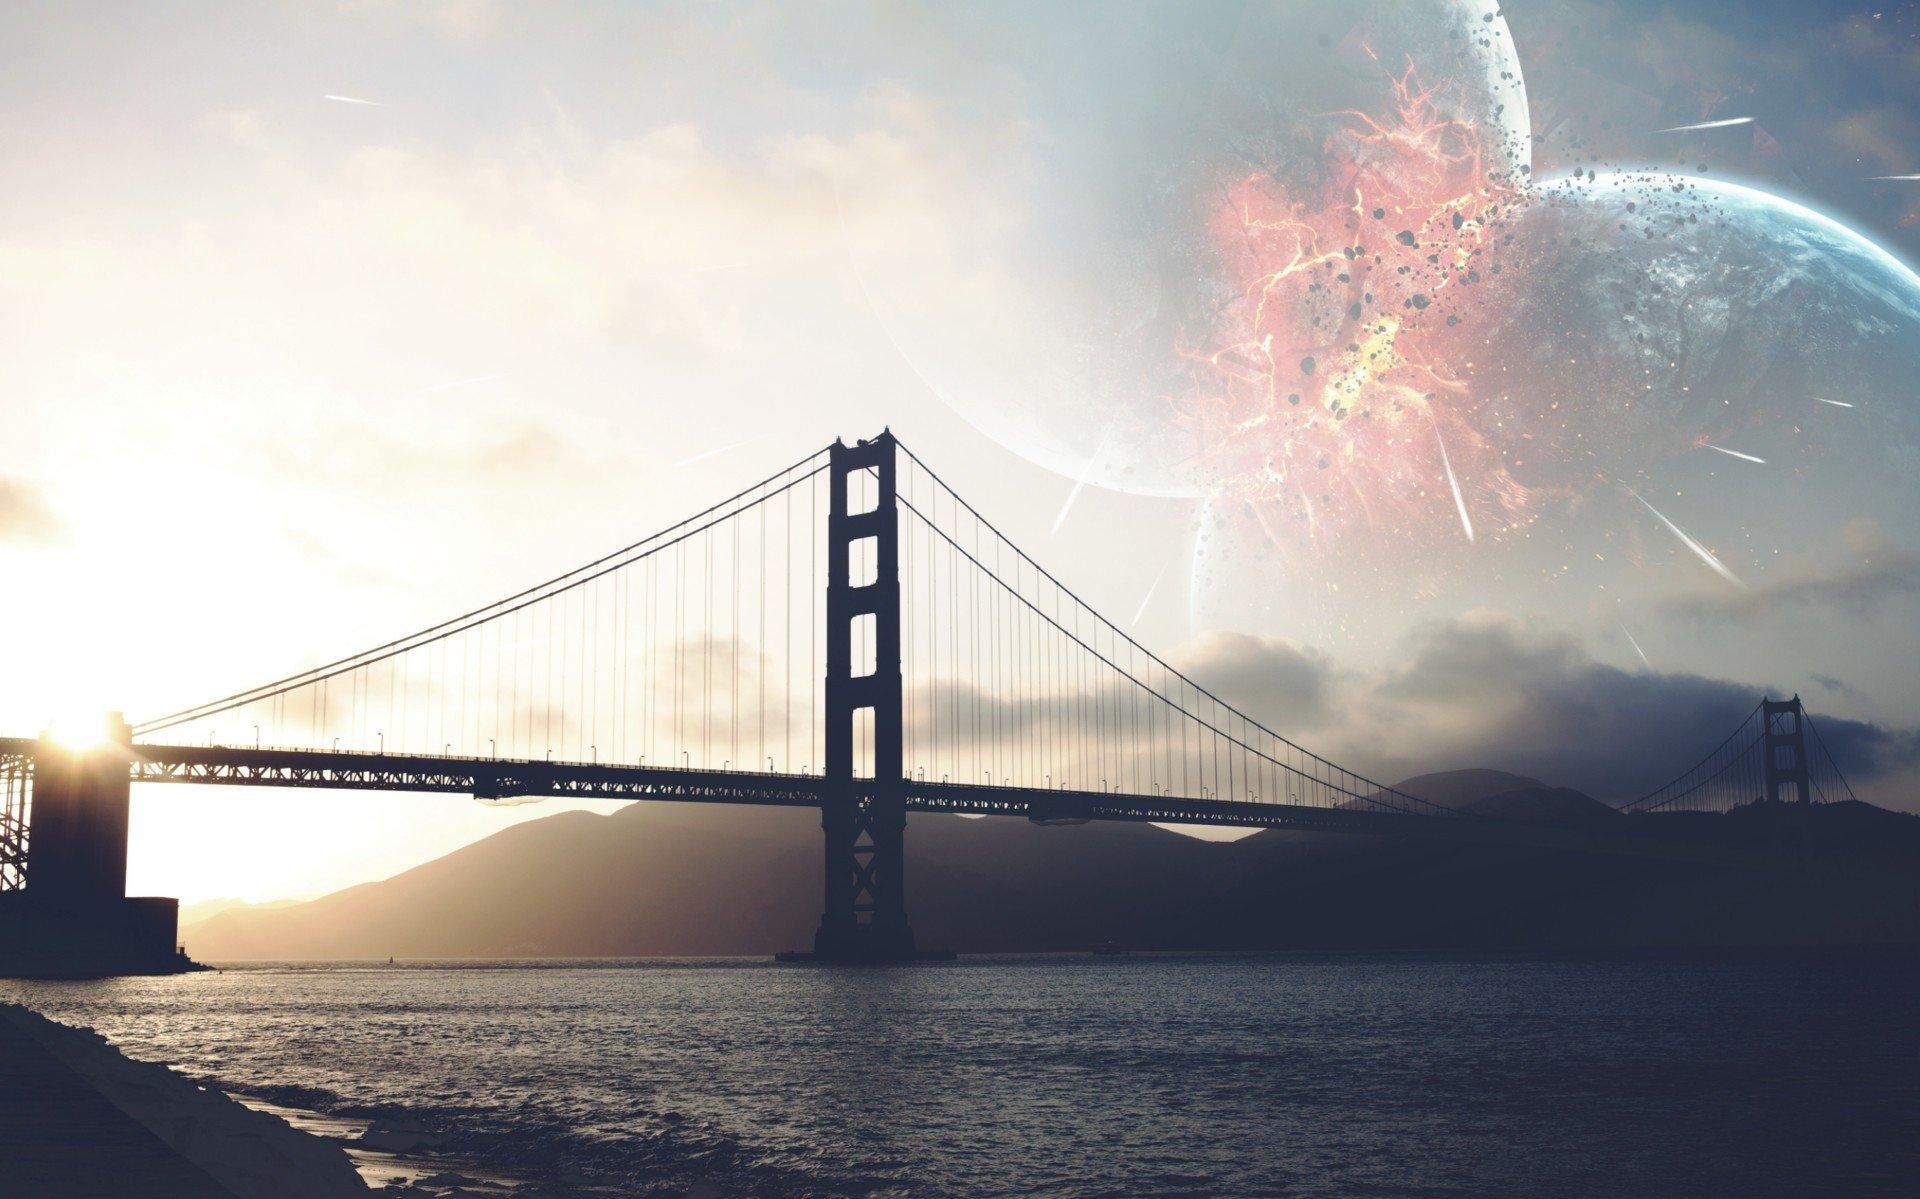 Photography - Manipulation  Bridge Planet Golden Gate Collision Sci Fi Wallpaper